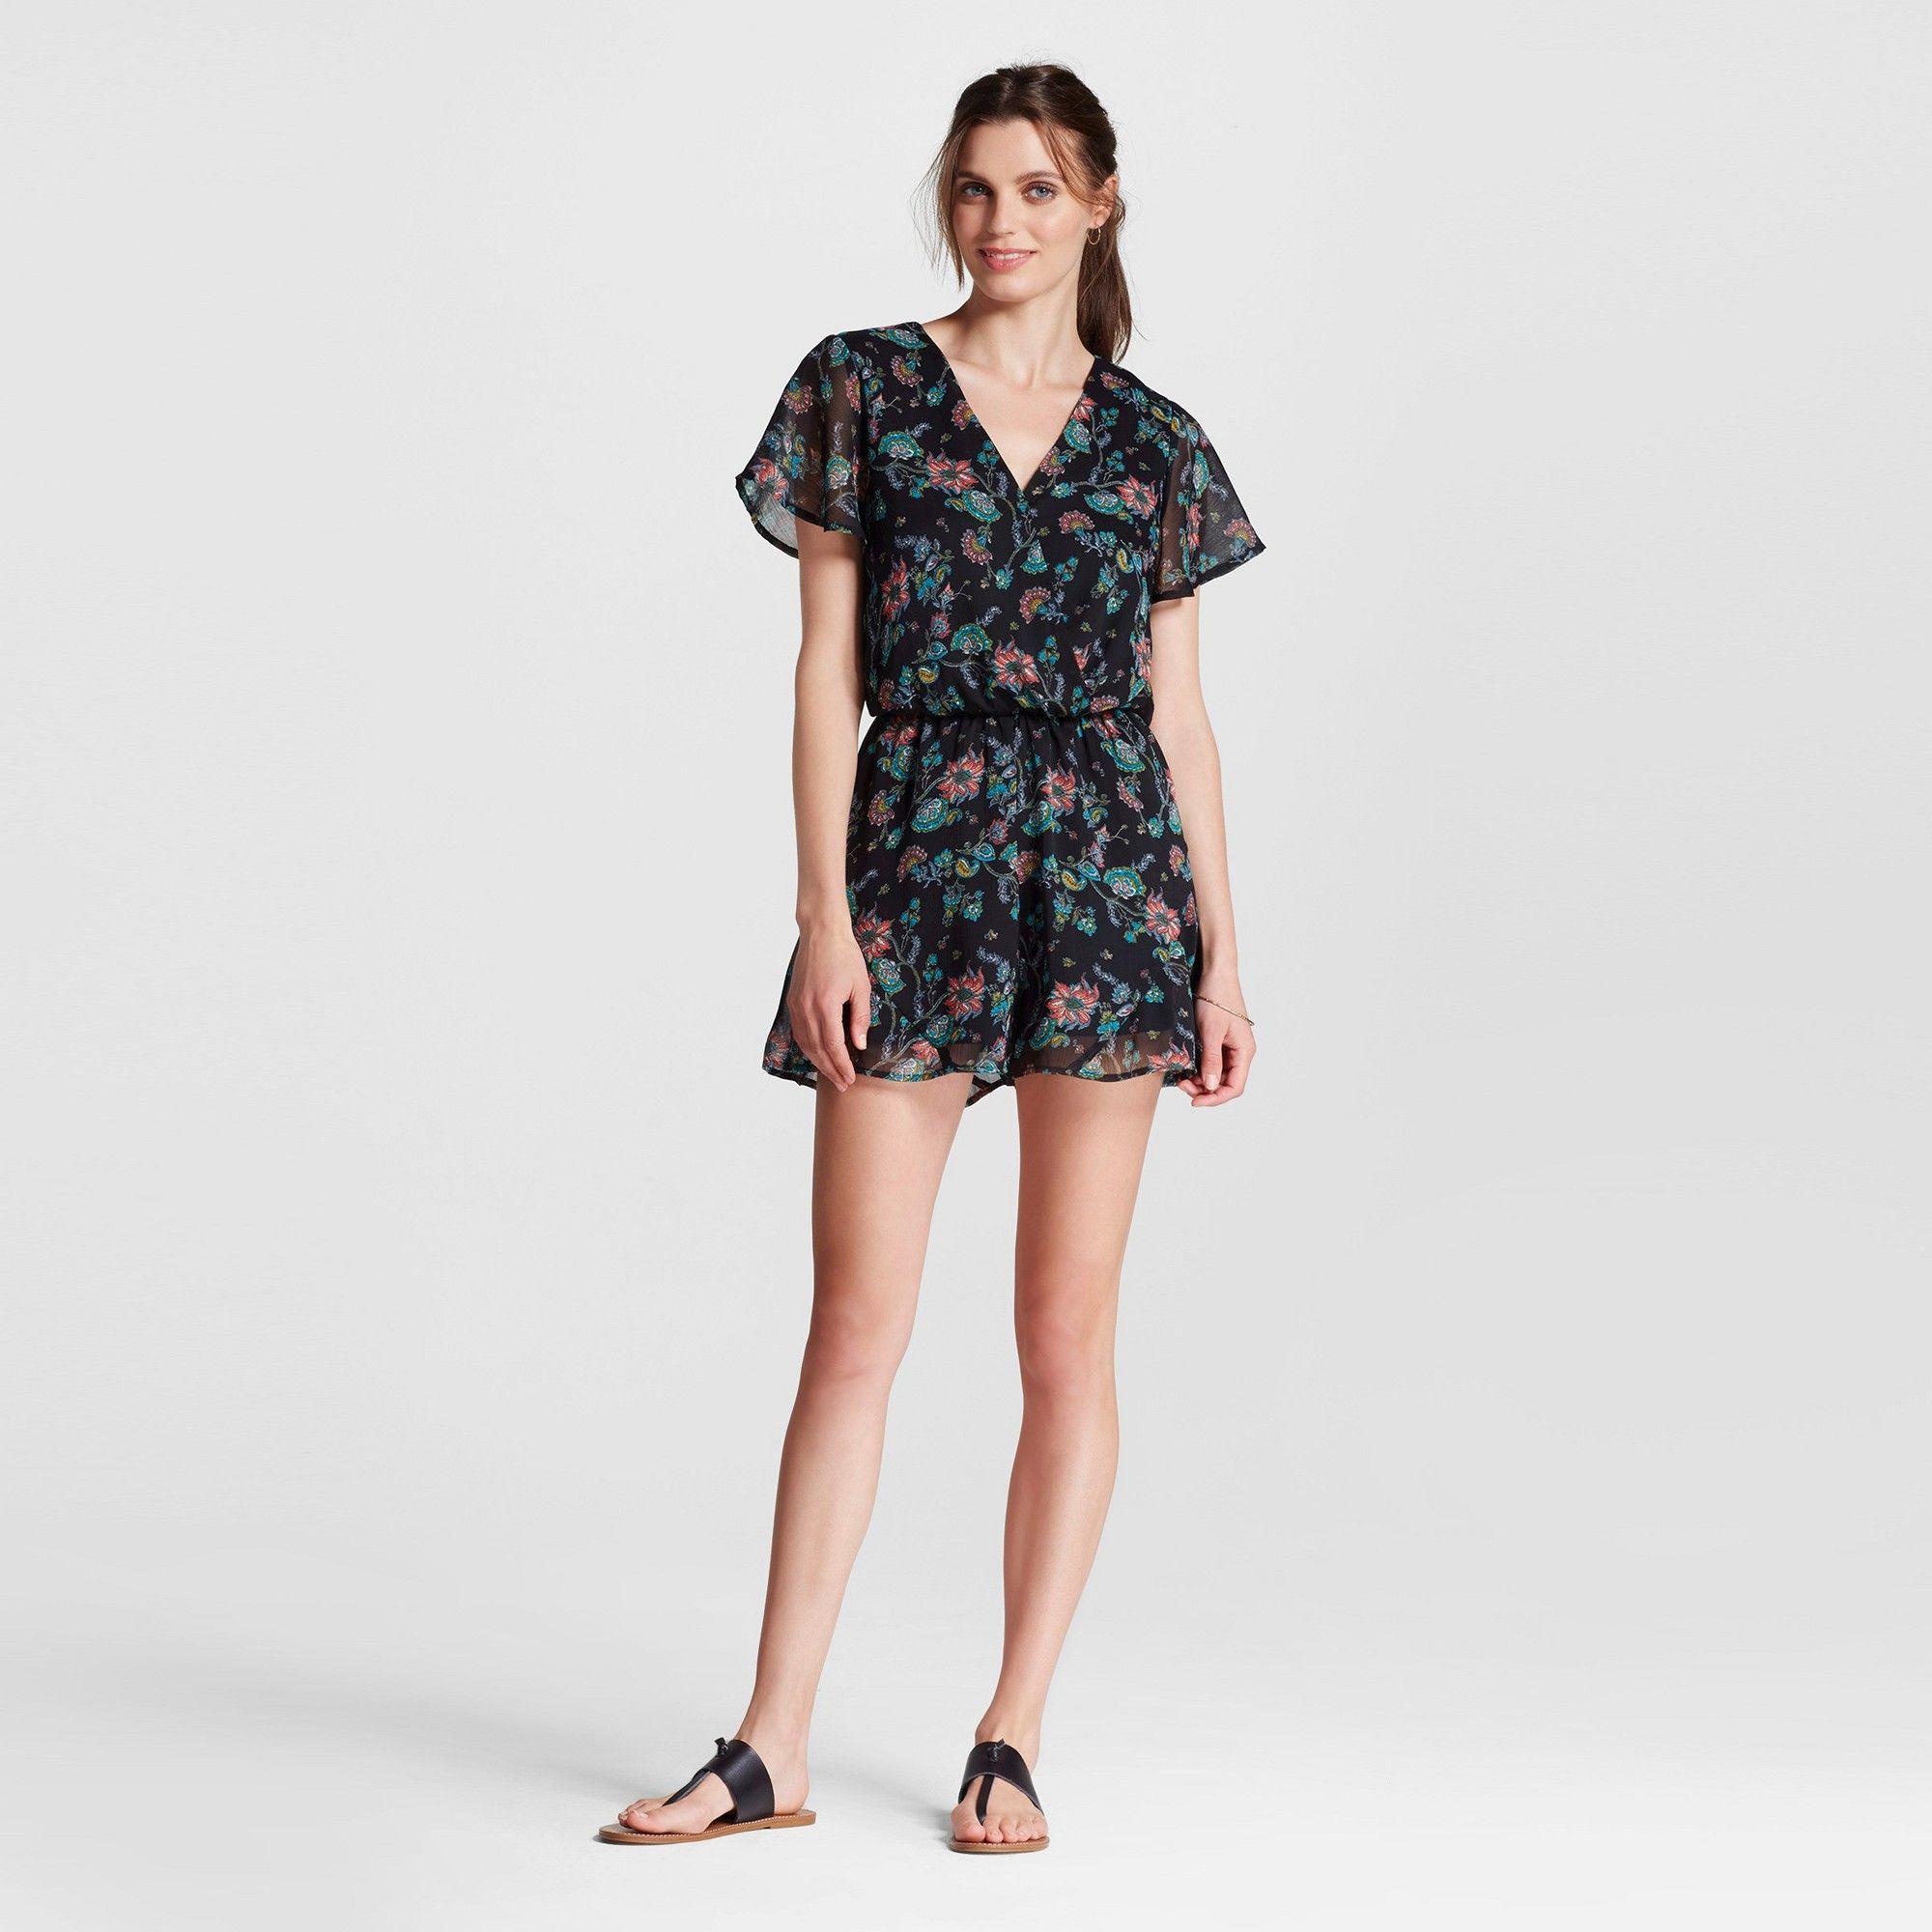 f06b1901afa Women s V-Neck Short Sleeve Romper - Xhilaration (Juniors )